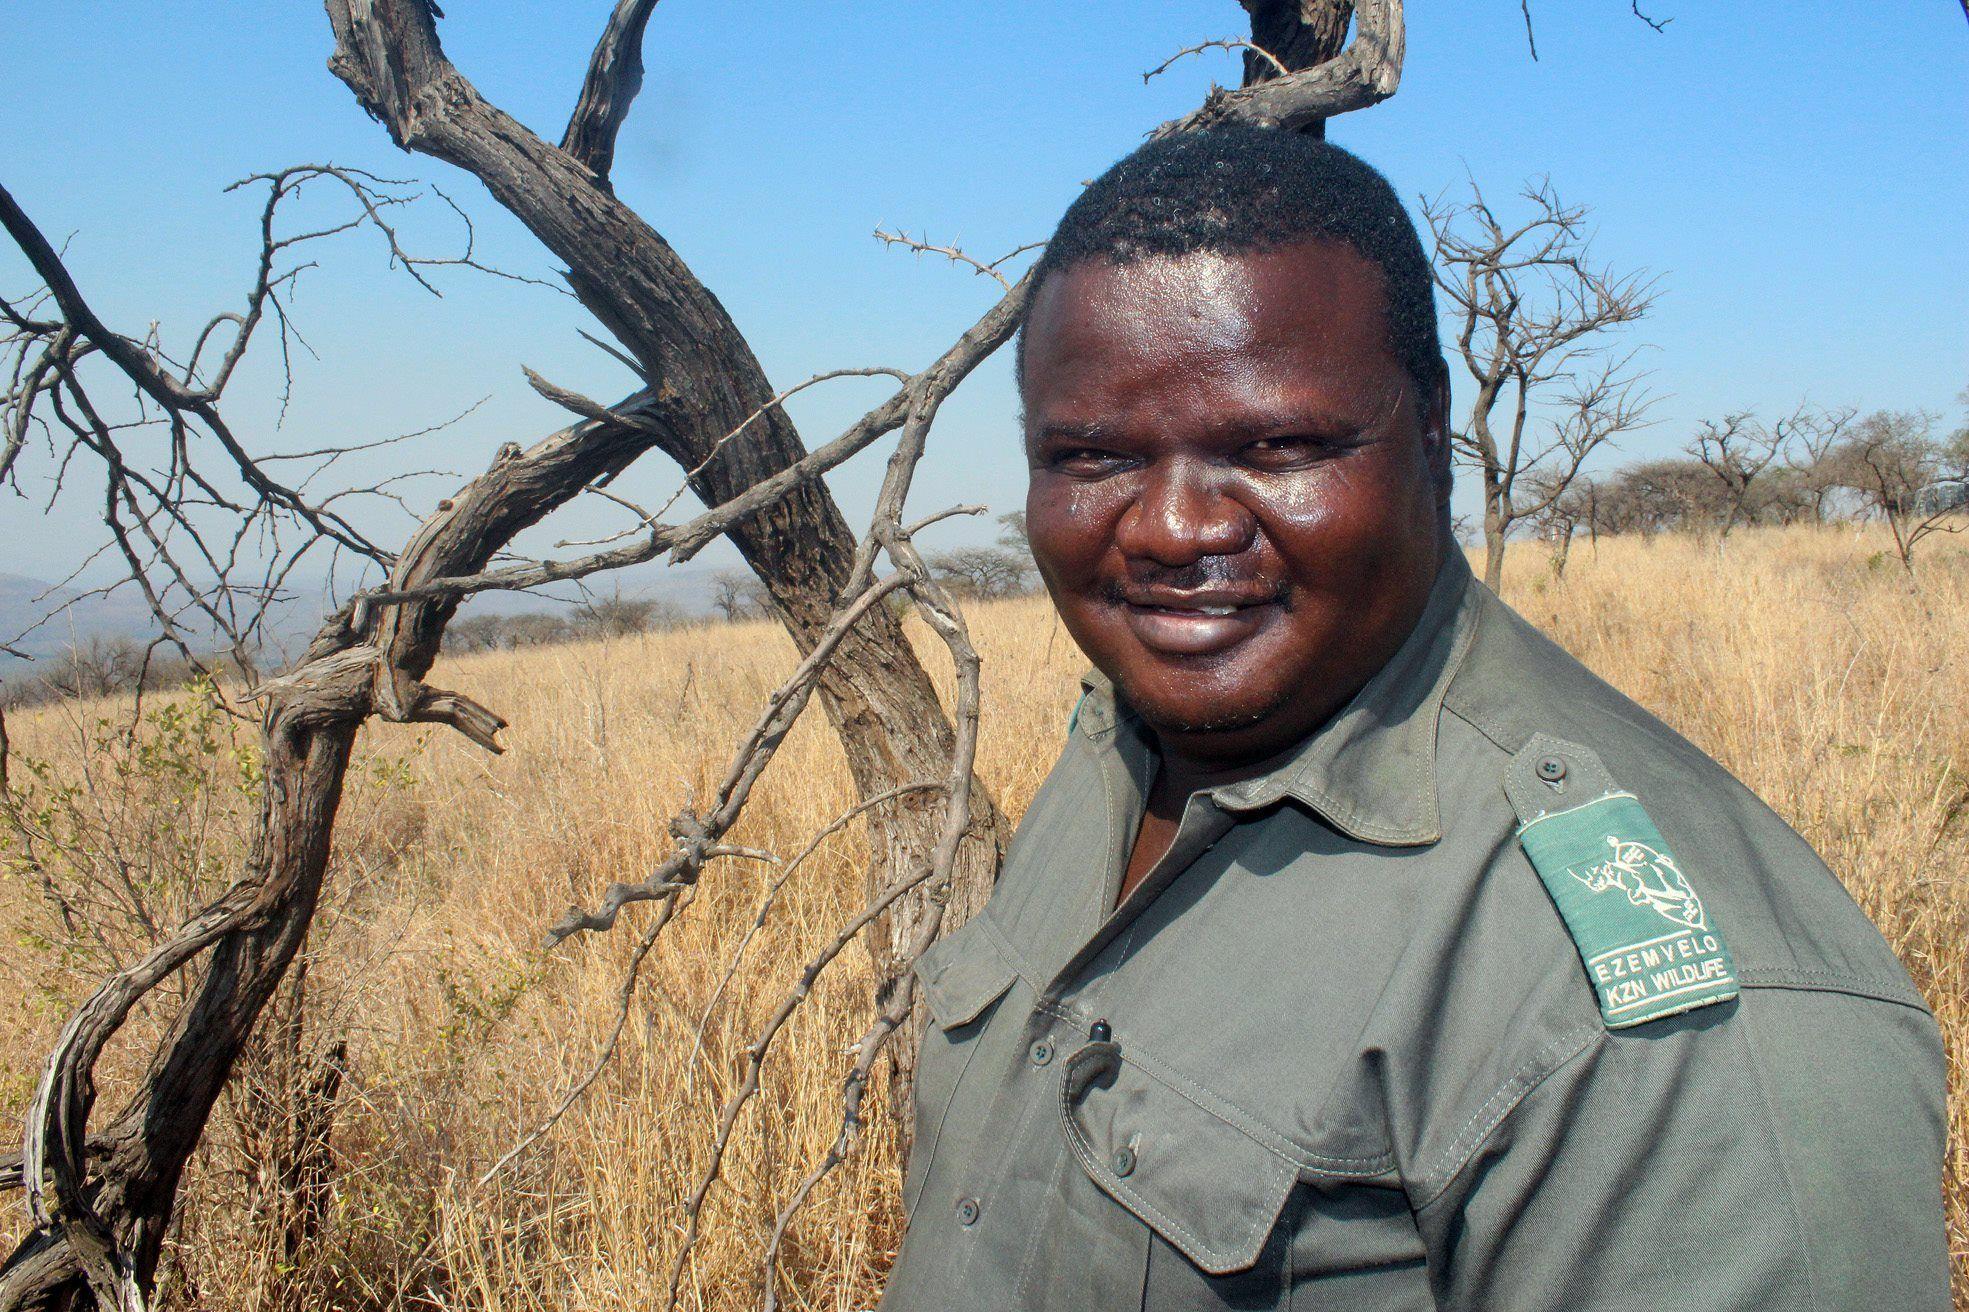 The human face of the rhino wars. Honoured for dedication: Staff Sergeant Bhekinkosi Mkhwanazi was awarded the Maqubu Ntombela Award for being Ezemvelo's best field ranger last year. KZN Wildlife October 28, 2014